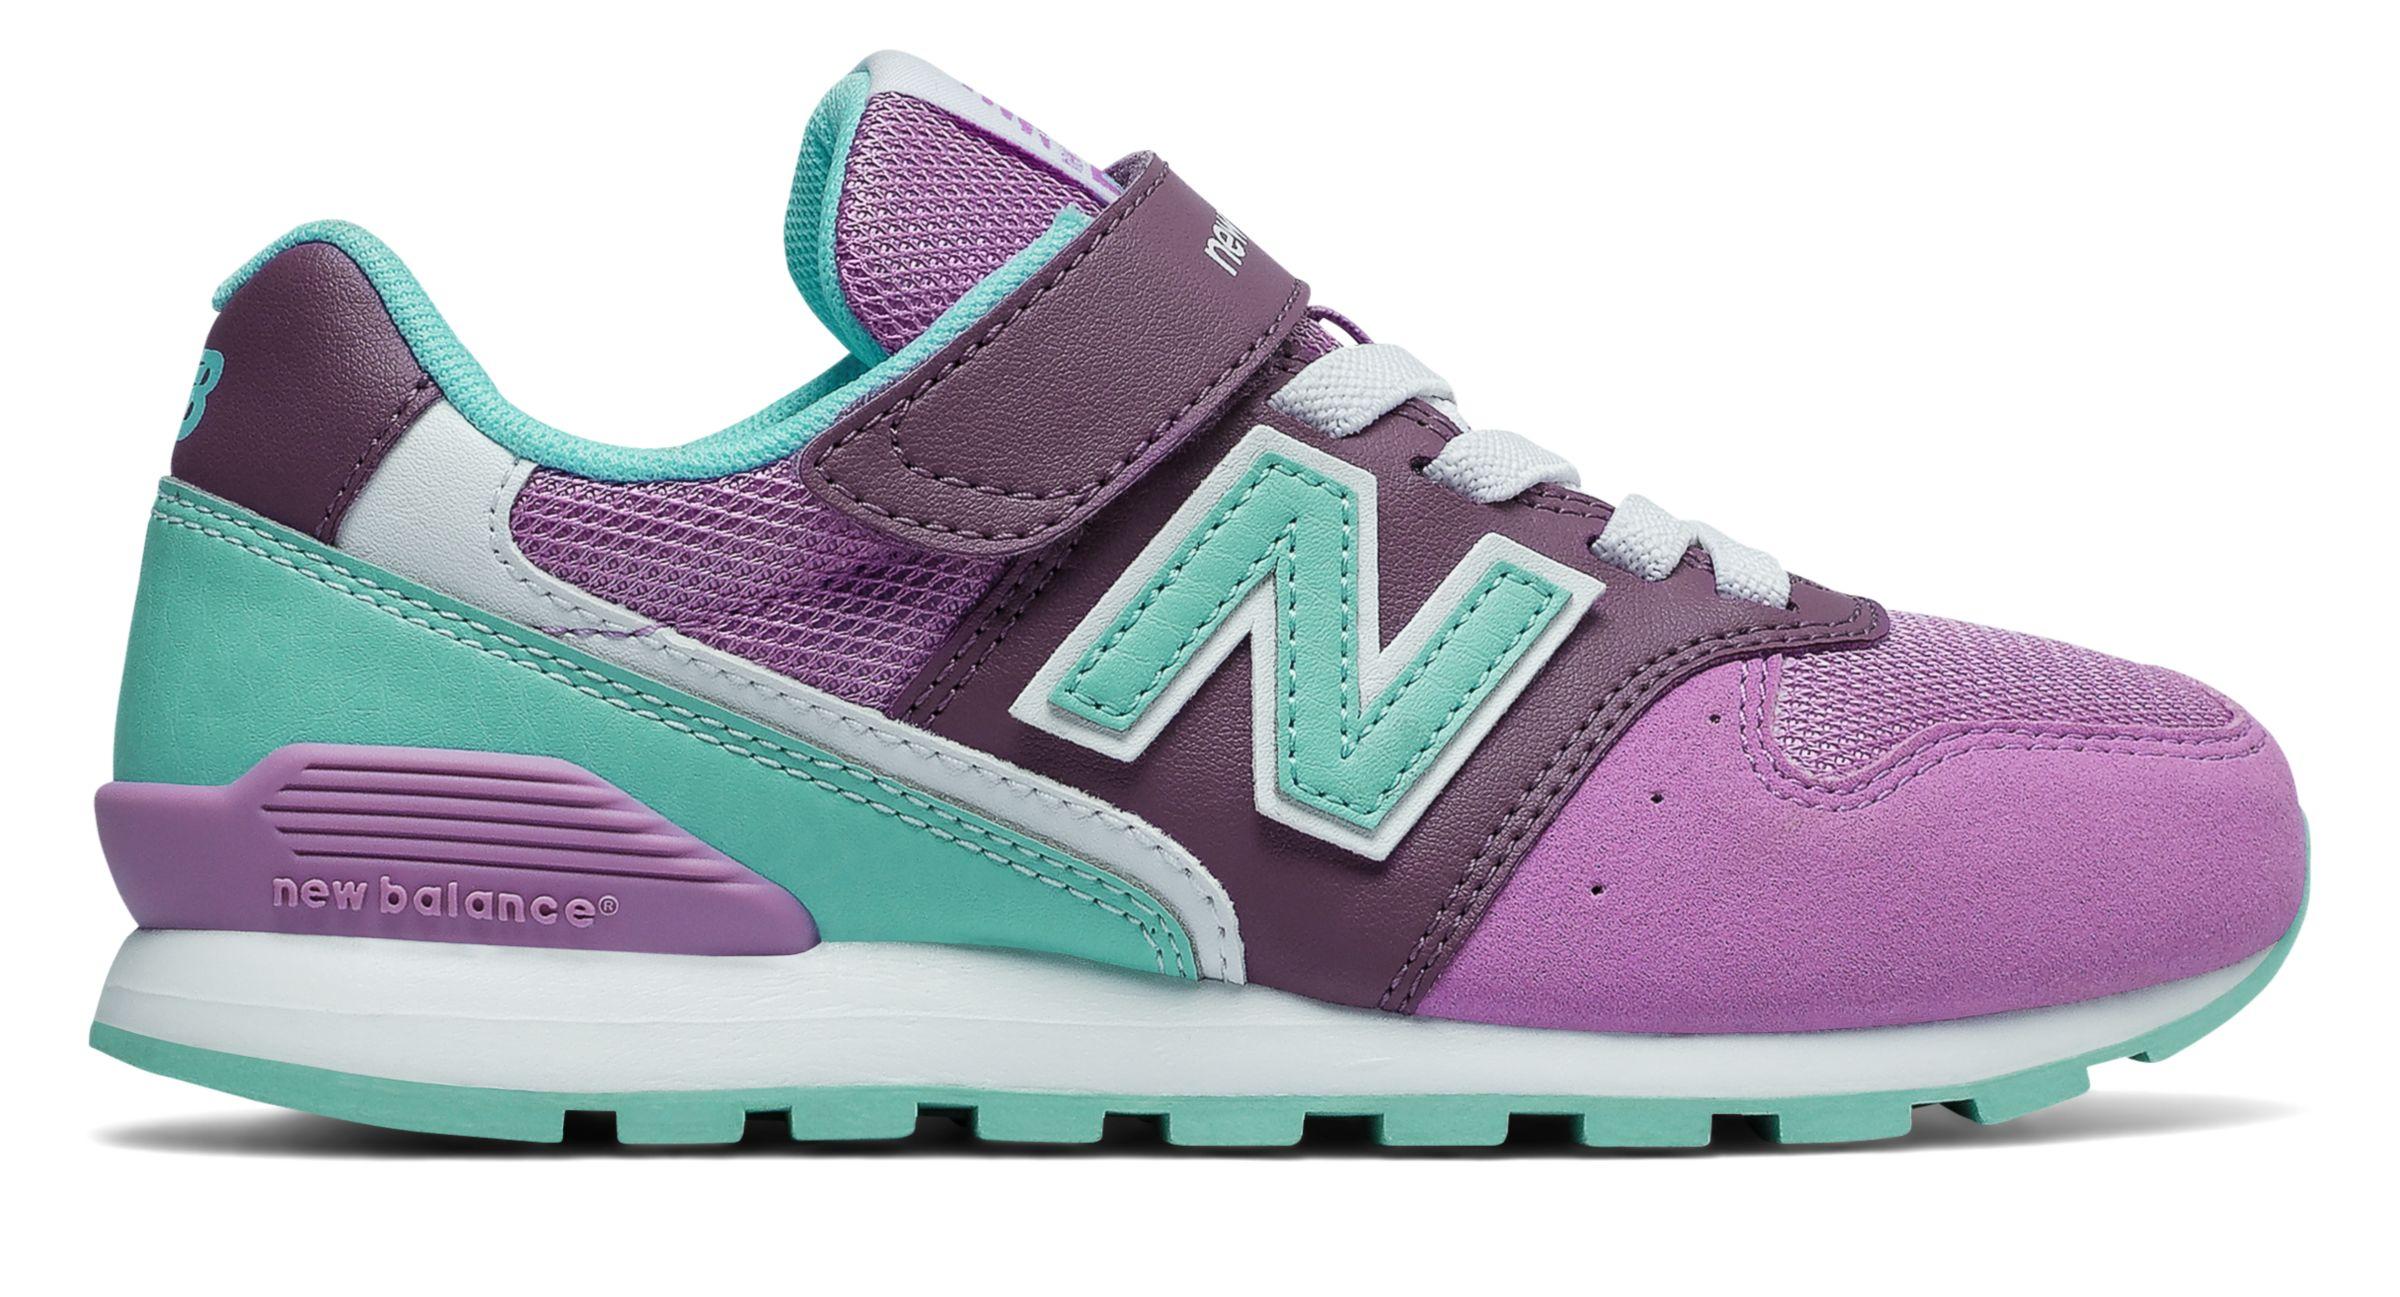 NB New Balance 996v2, Violet with Sky